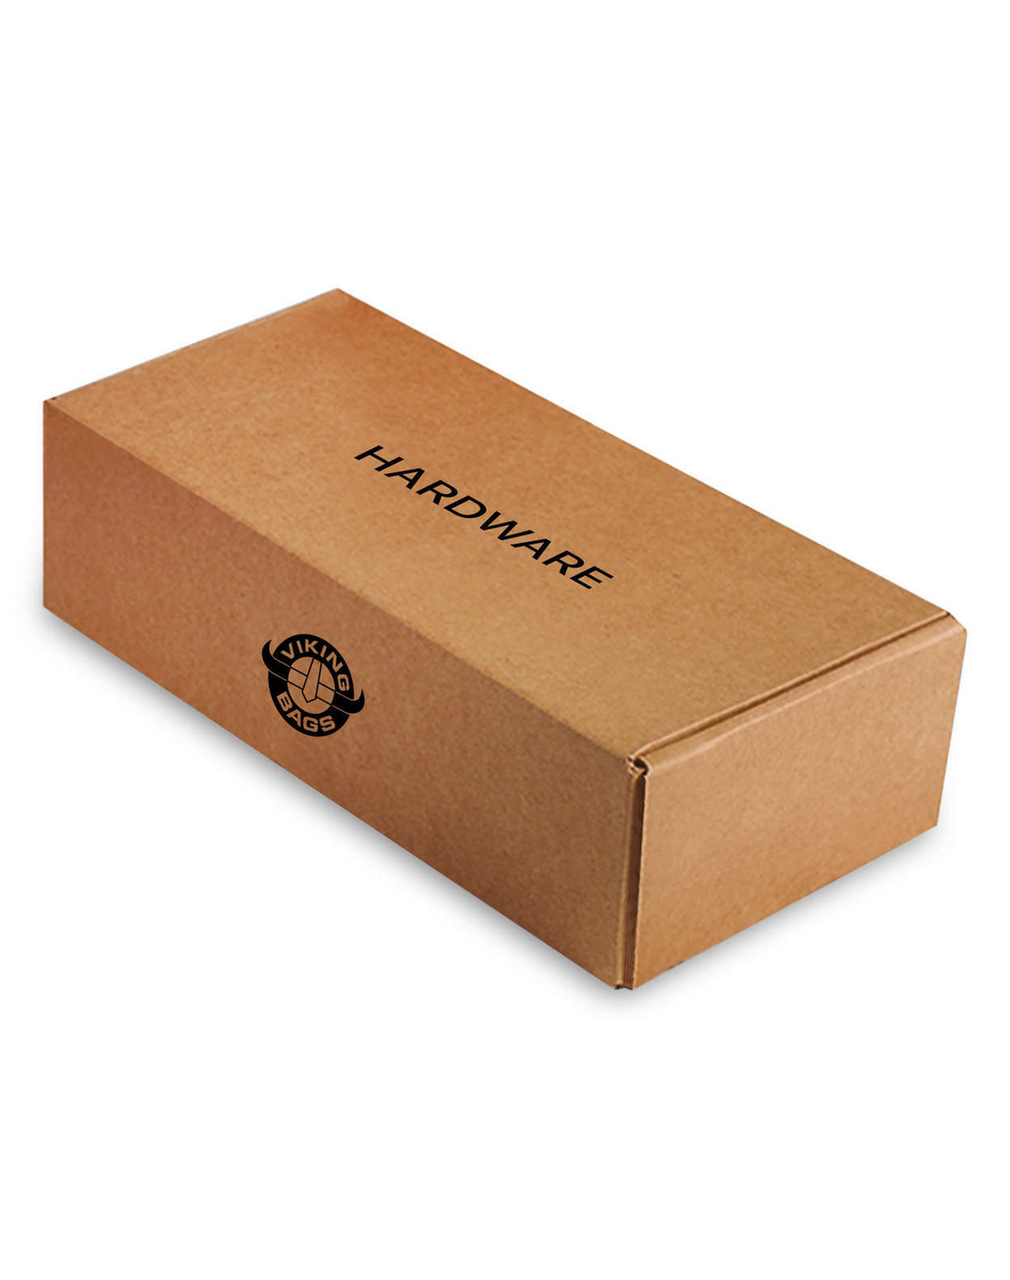 Honda 1500 Valkyrie Interstate SS Slanted Studded Medium Motorcycle Saddlebags Hardware Box